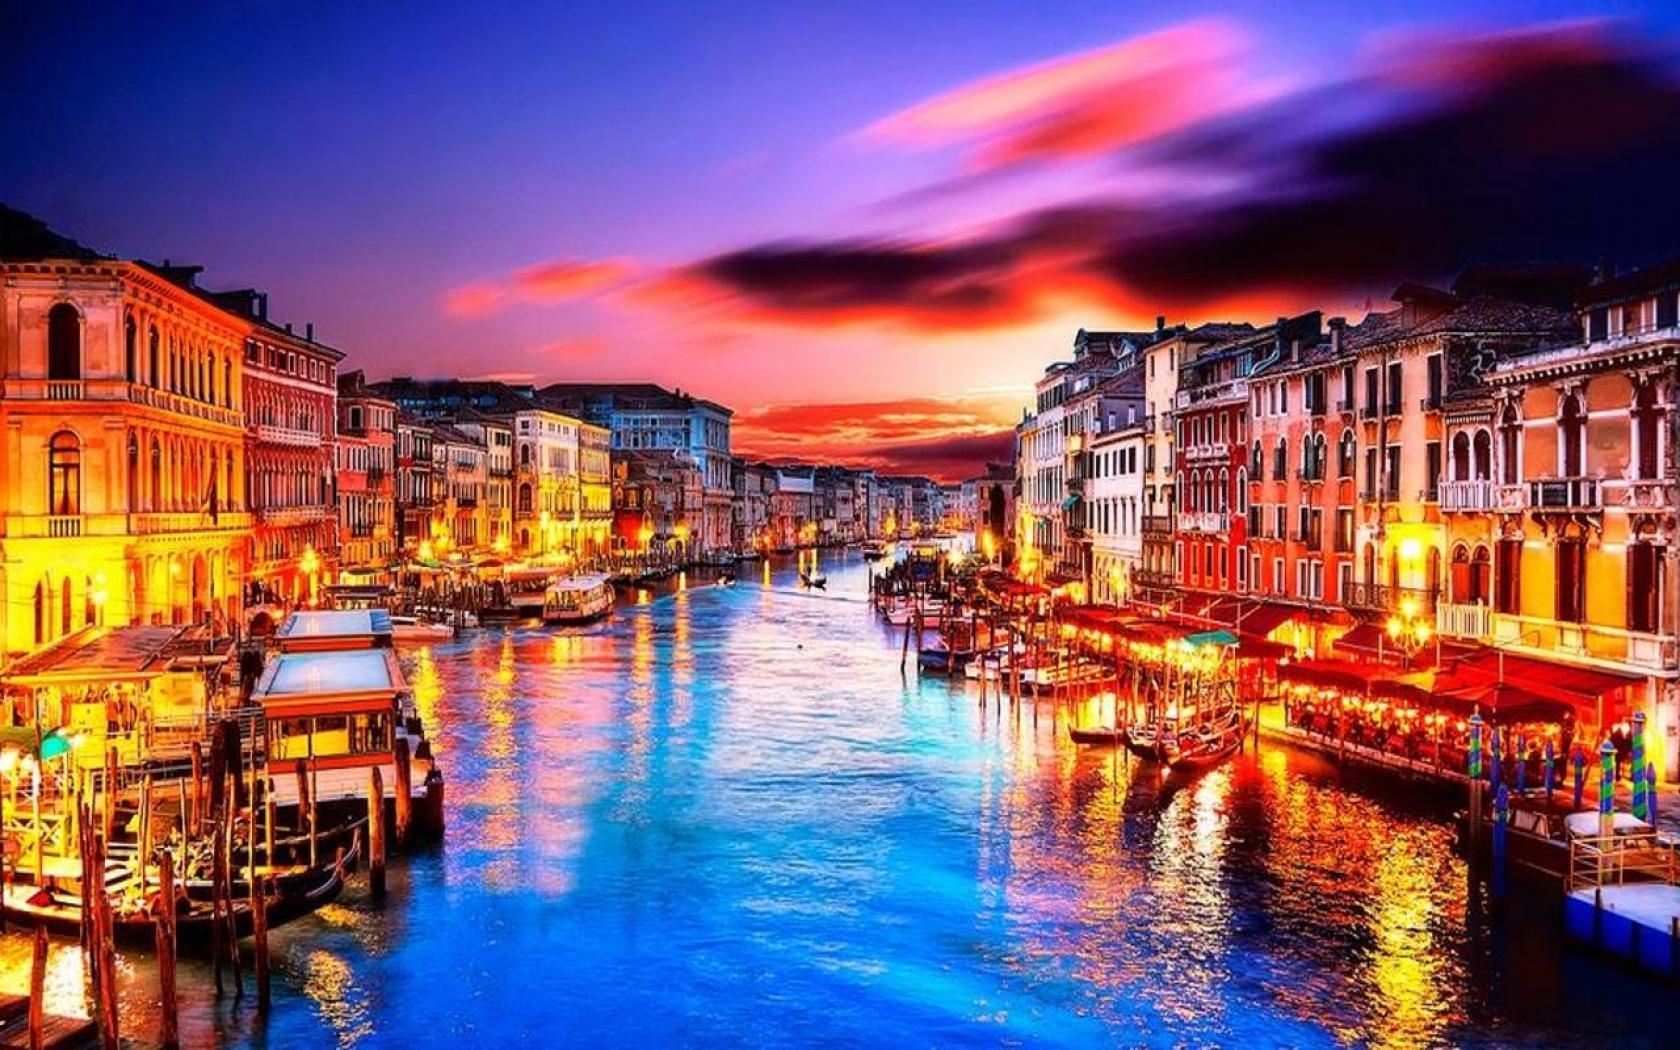 Venice Italy Wallpaper  WallpaperSafari